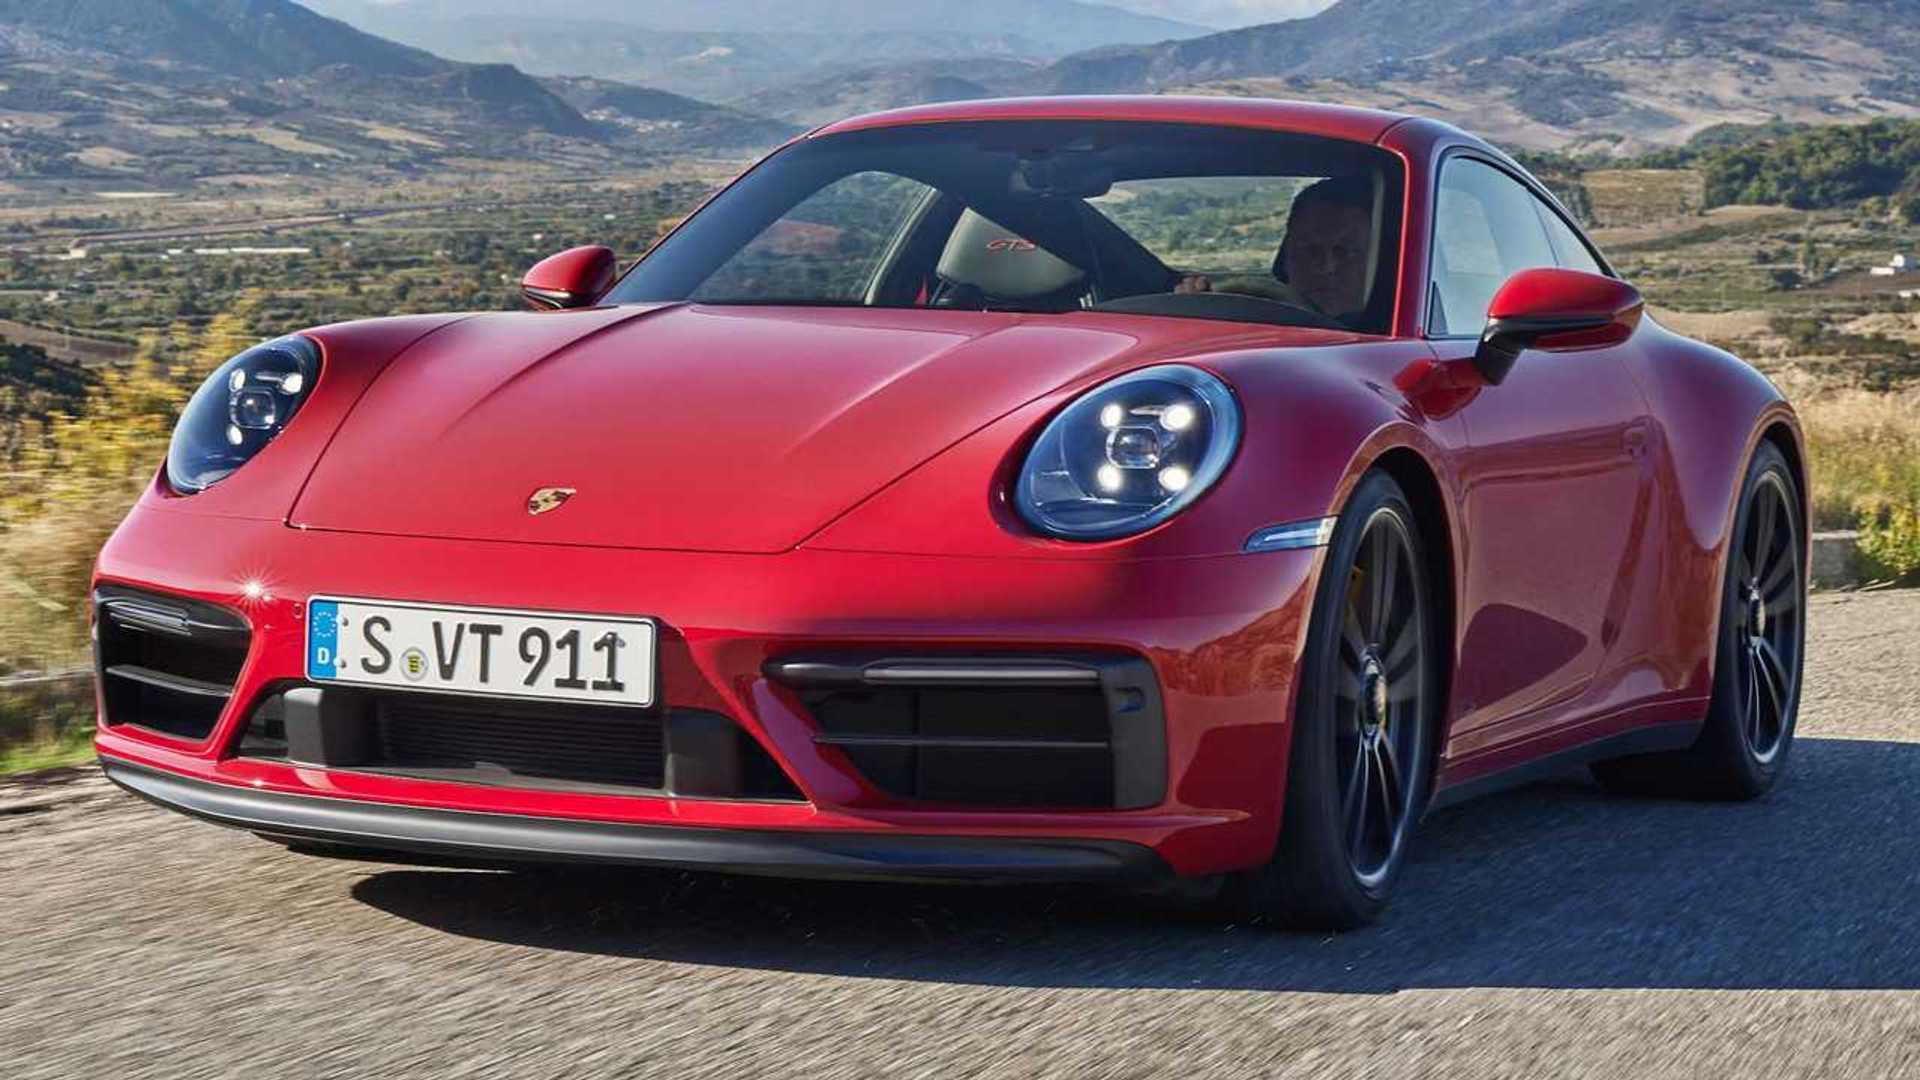 2022 Porsche 911 GTS Debuts, Packs More Power Than Carrera S